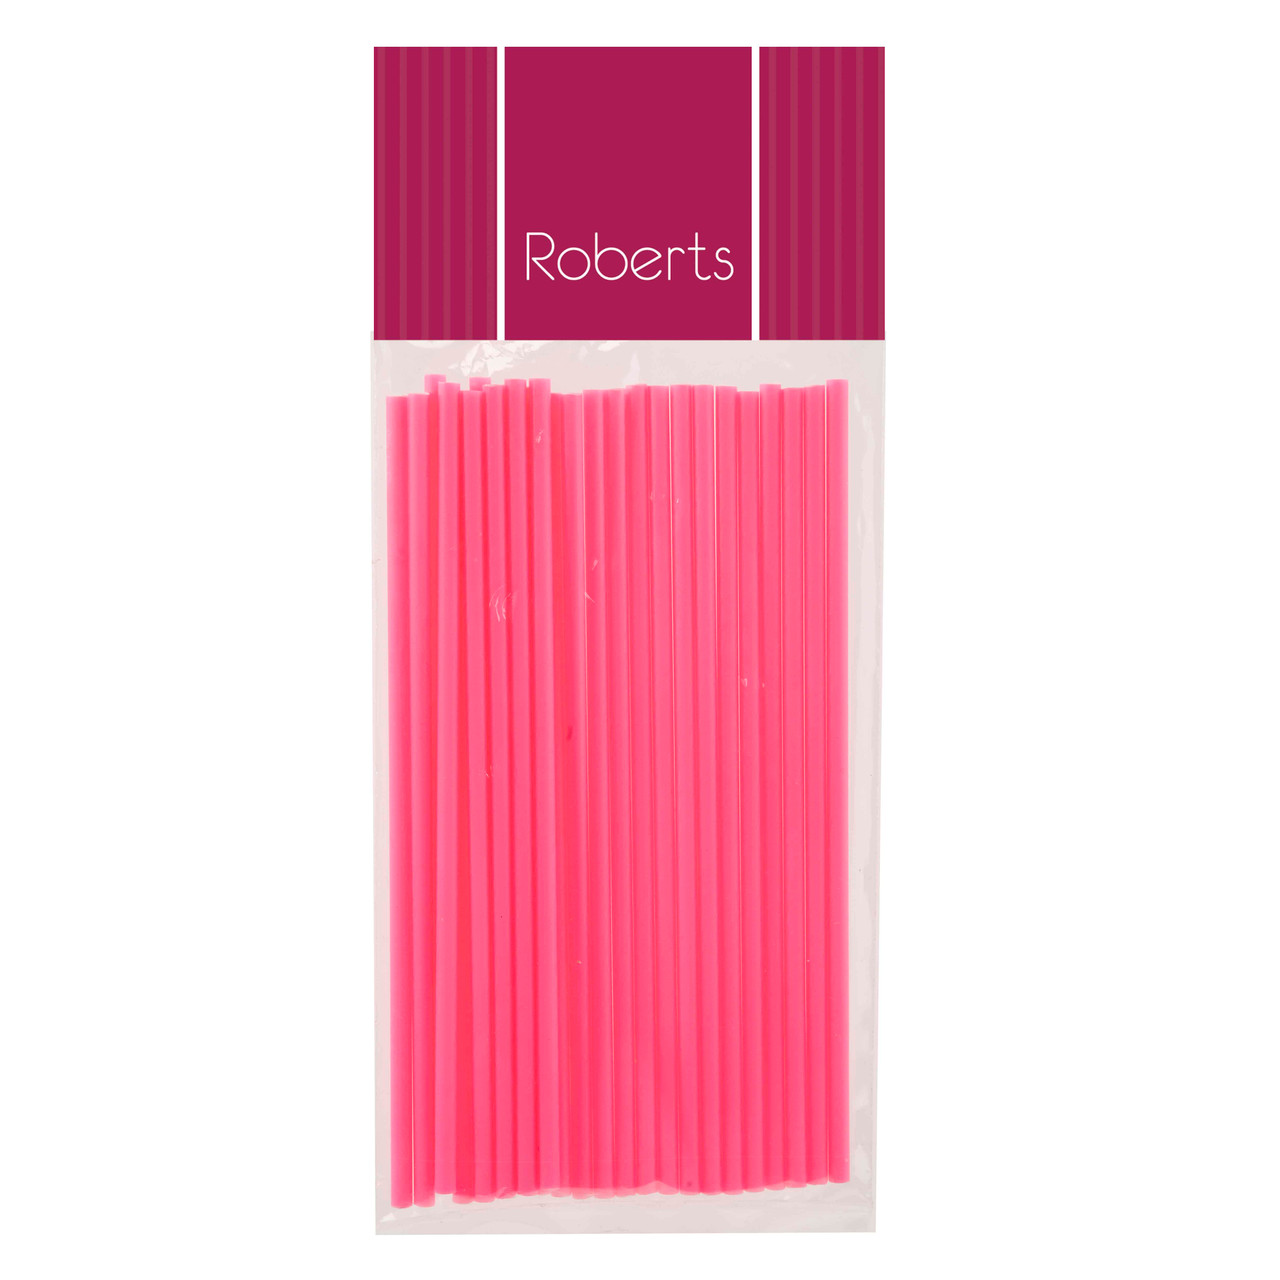 150 mm Fluoro Pink  Smooth LONG Lollypop Sticks Pkt 25